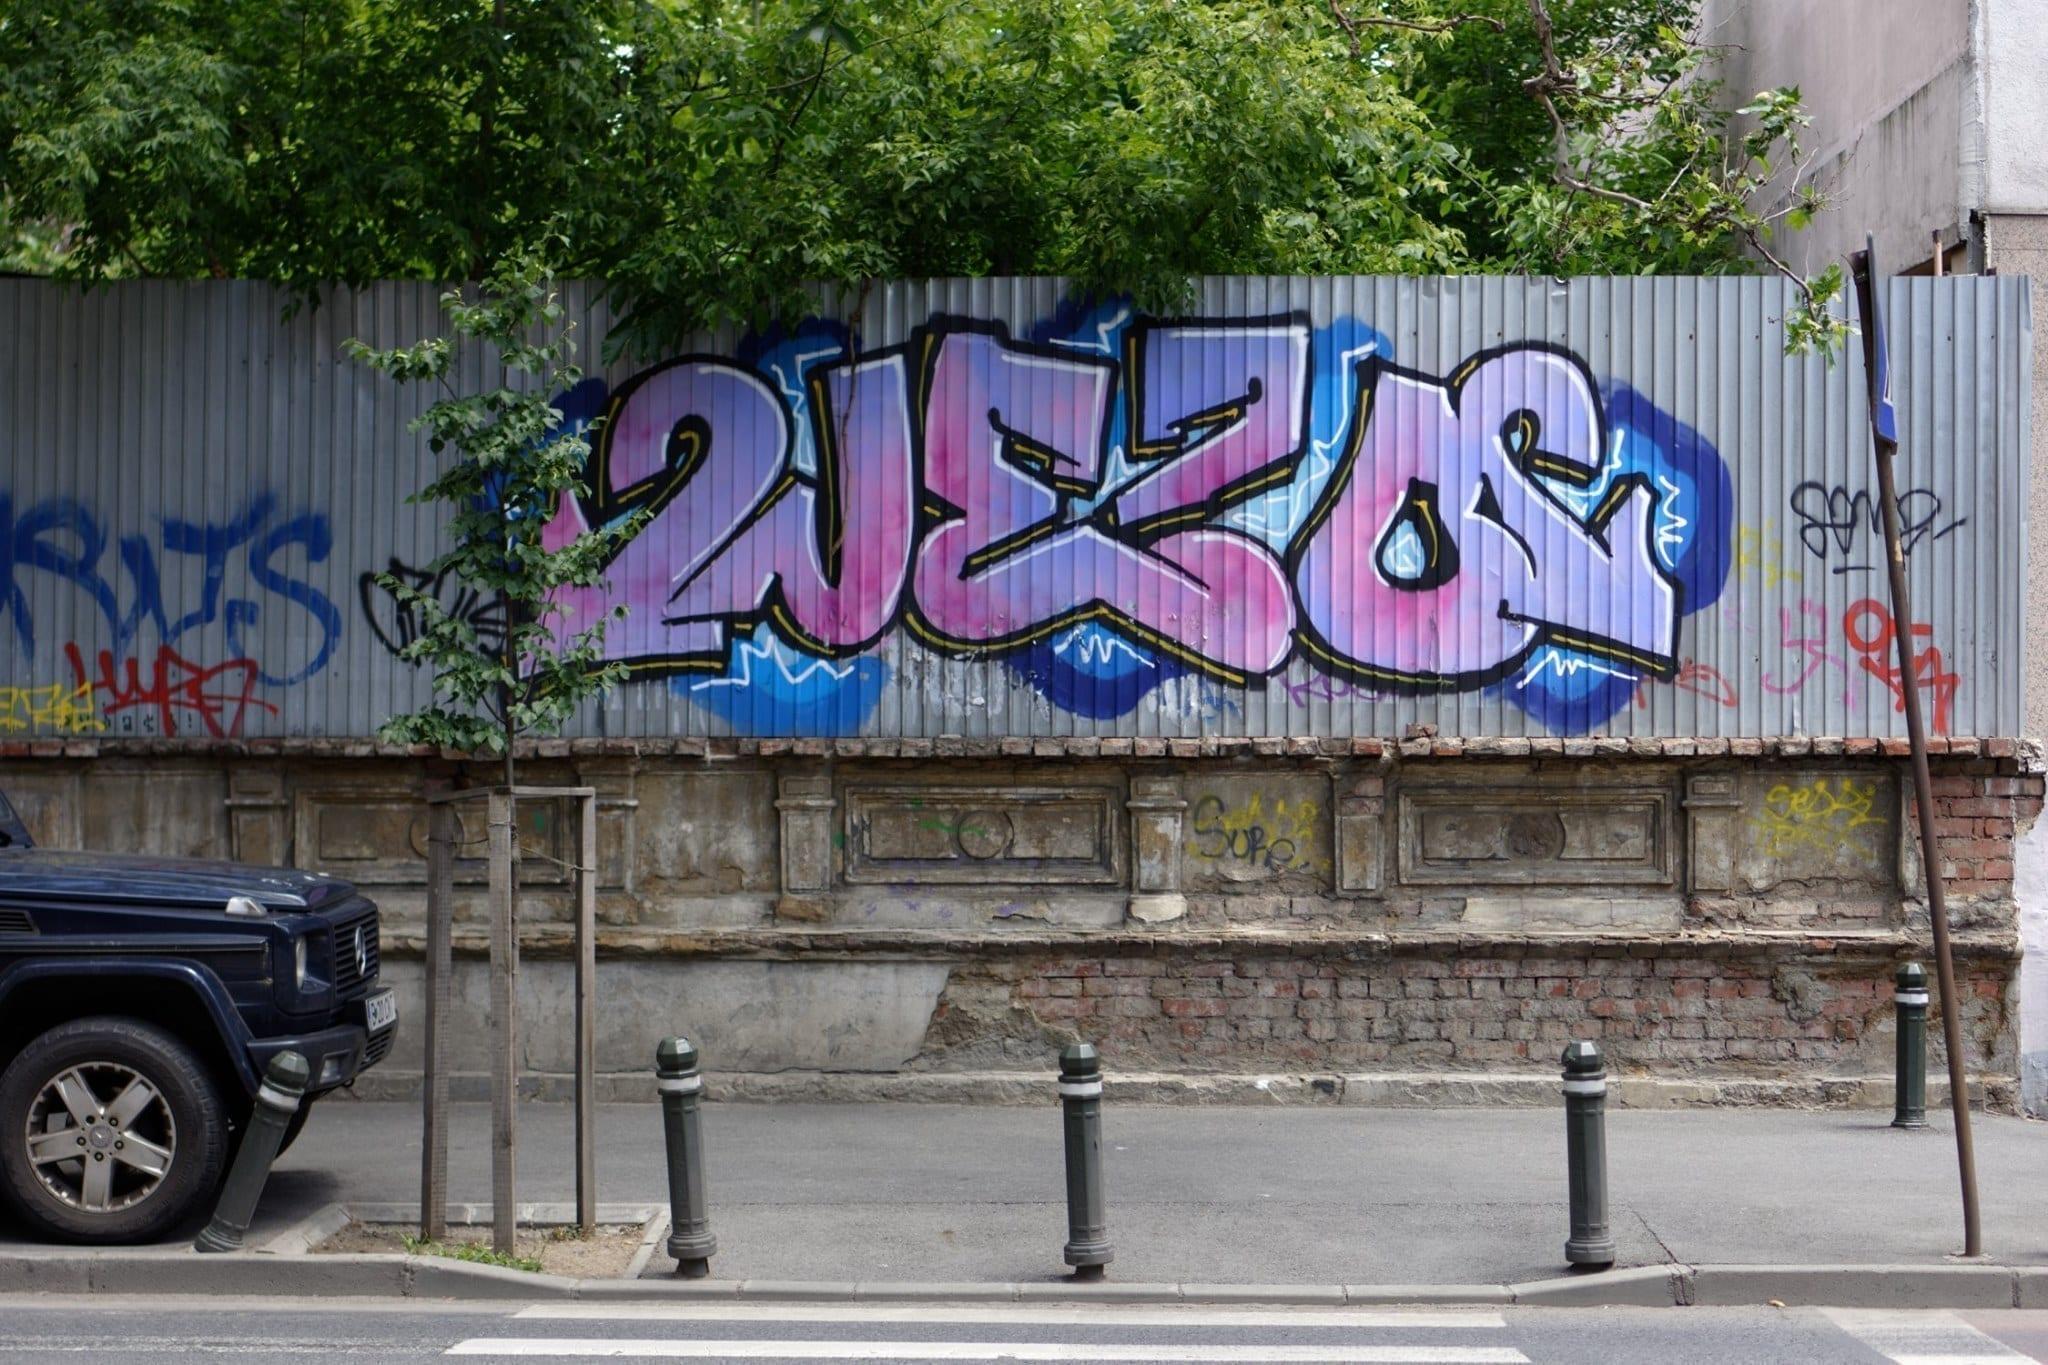 Wezo street art